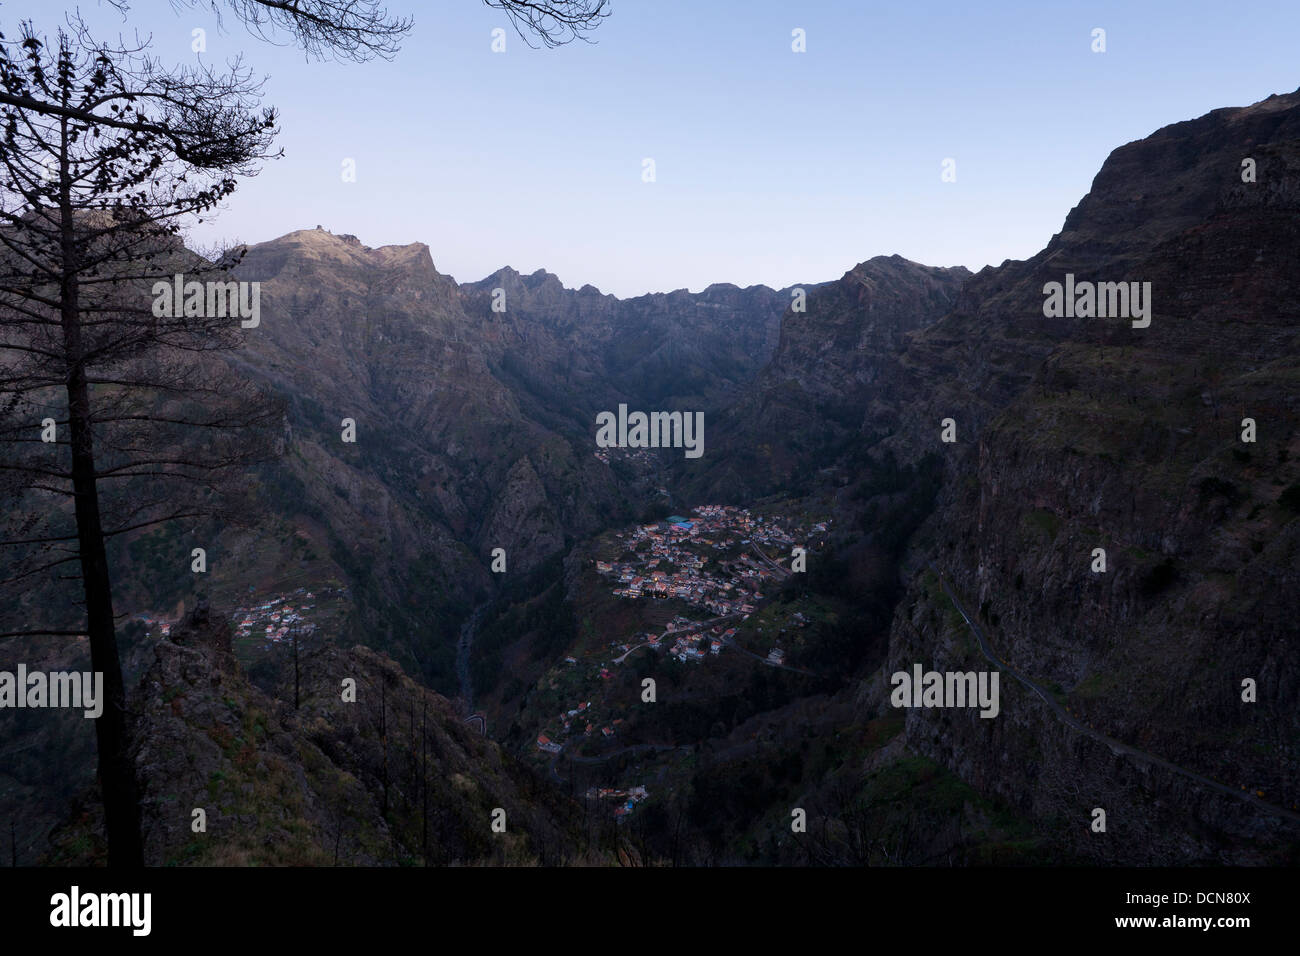 The village of Curral das Freiras as seen from the the path towards the viewpoint at Eira do Serrado. - Stock Image